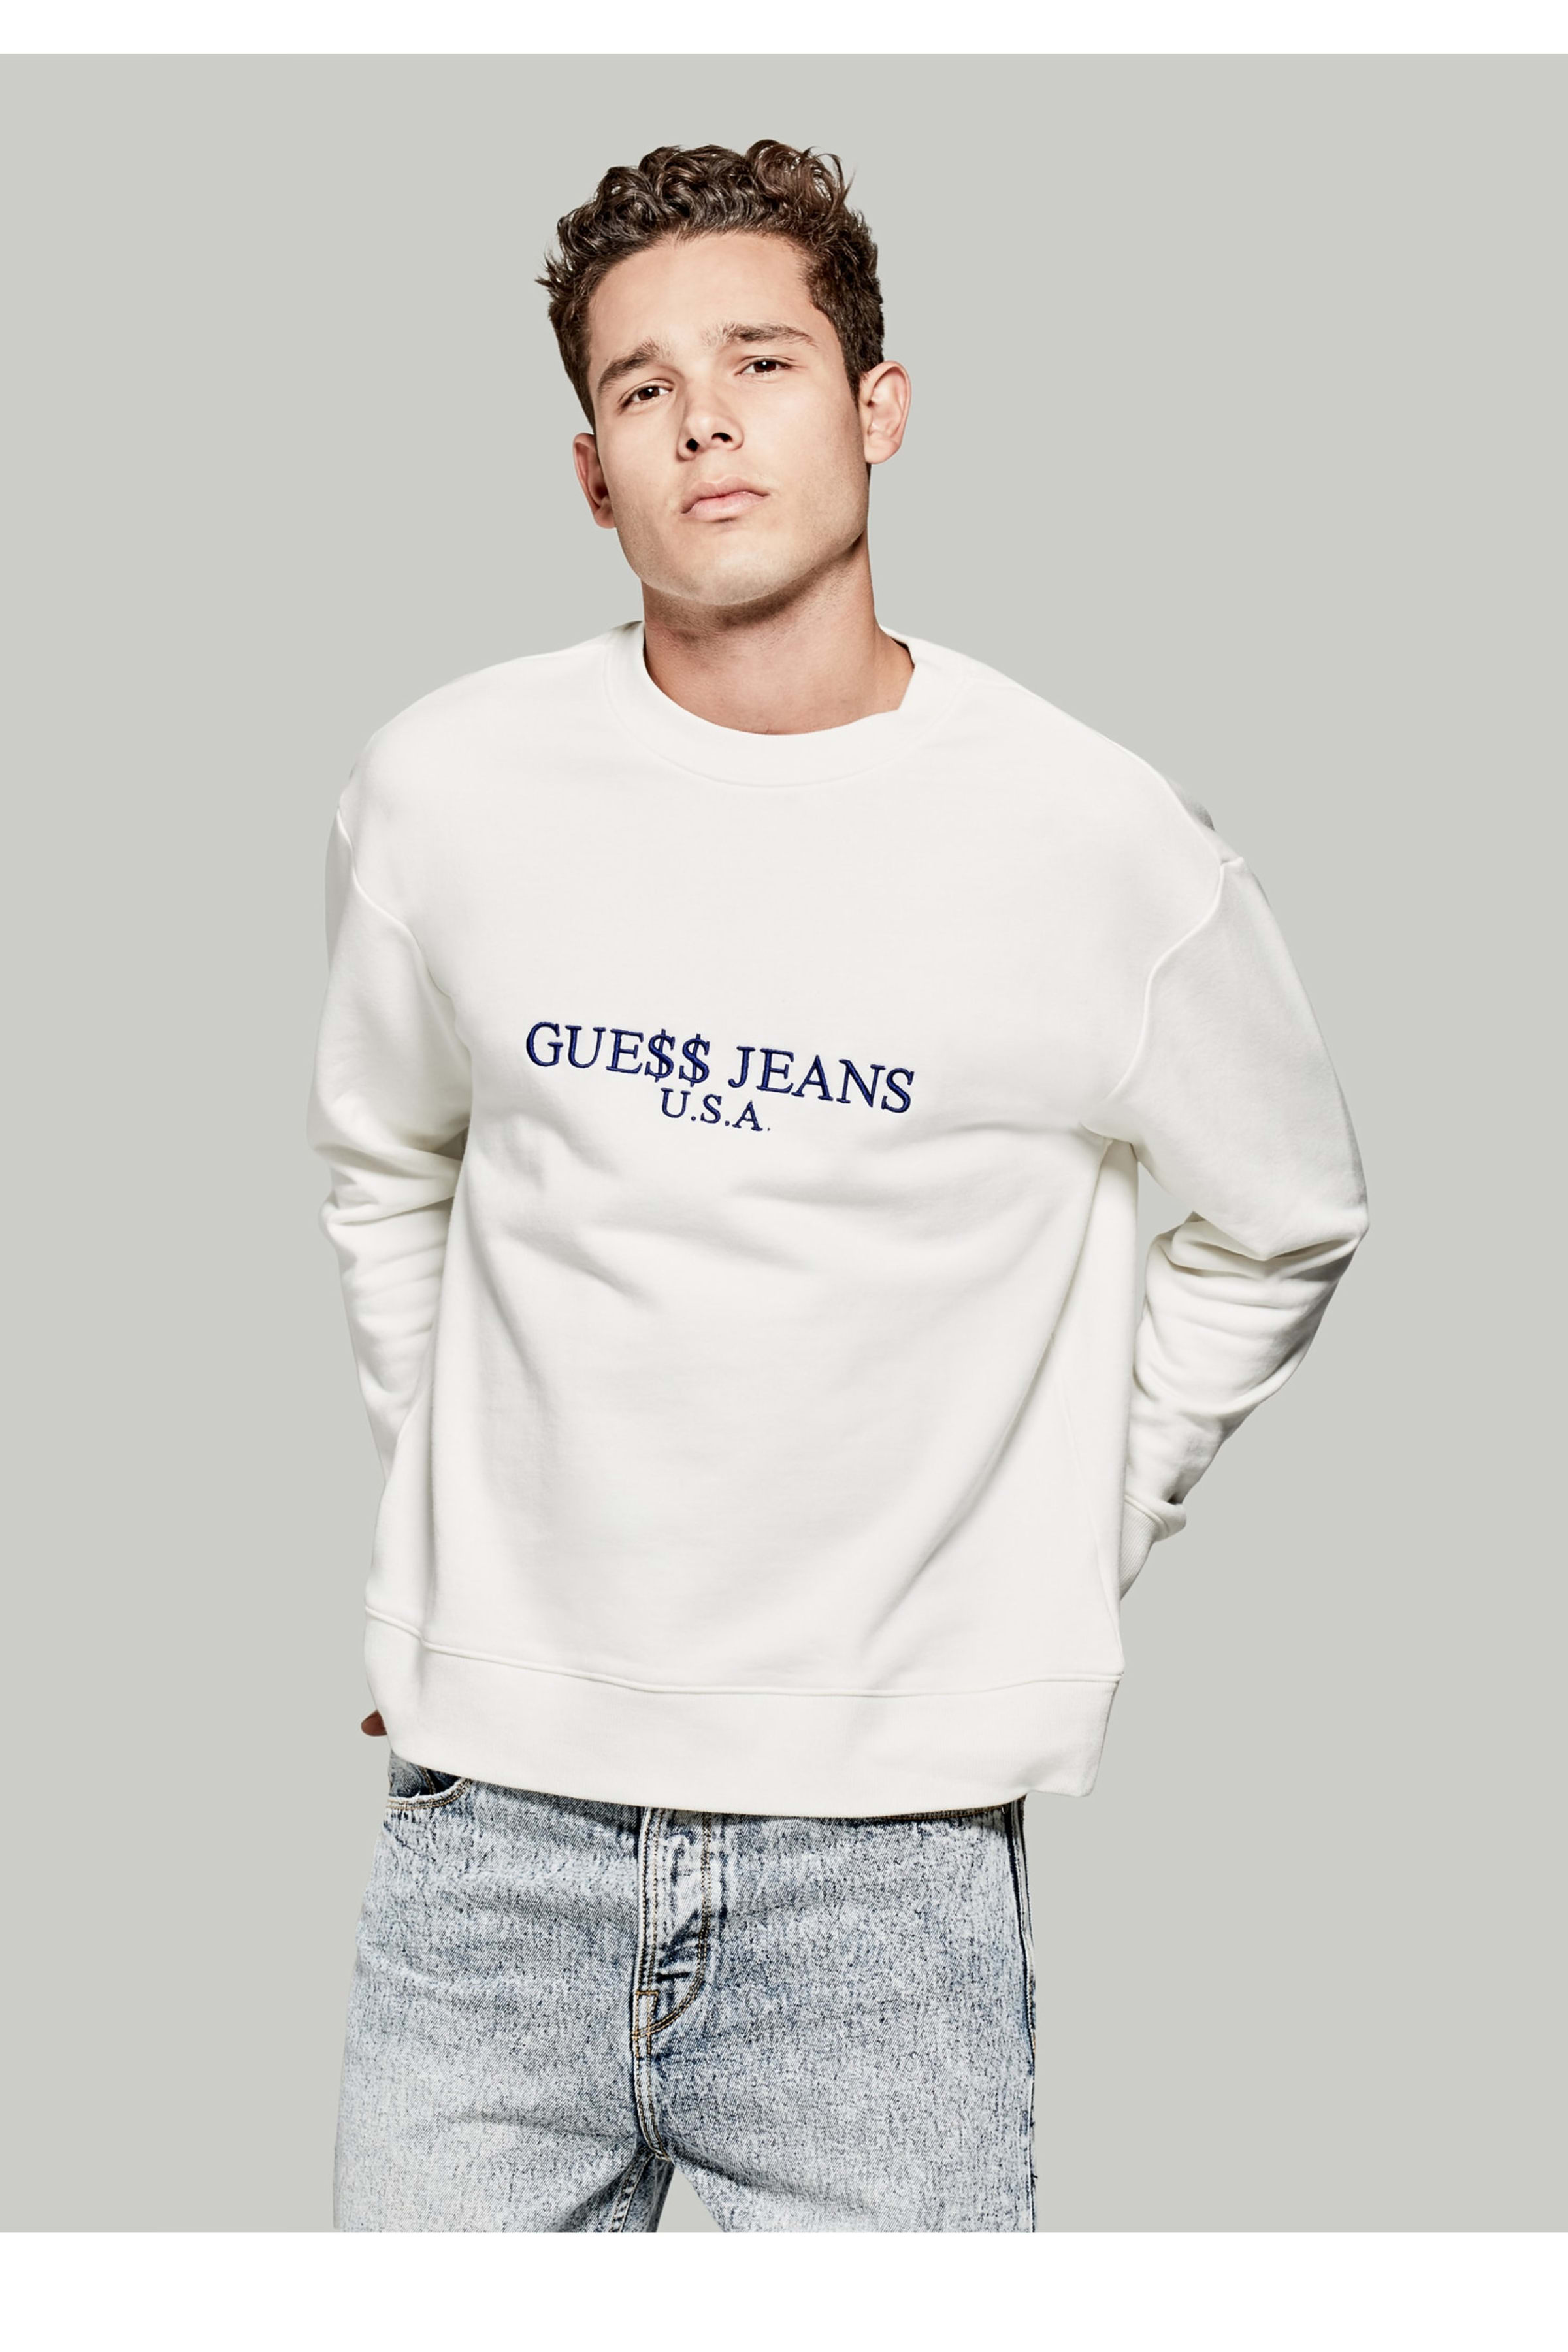 speical tilbud løbesko god pasform A$AP Rocky Logo Sweatshirt | GUESS.ca